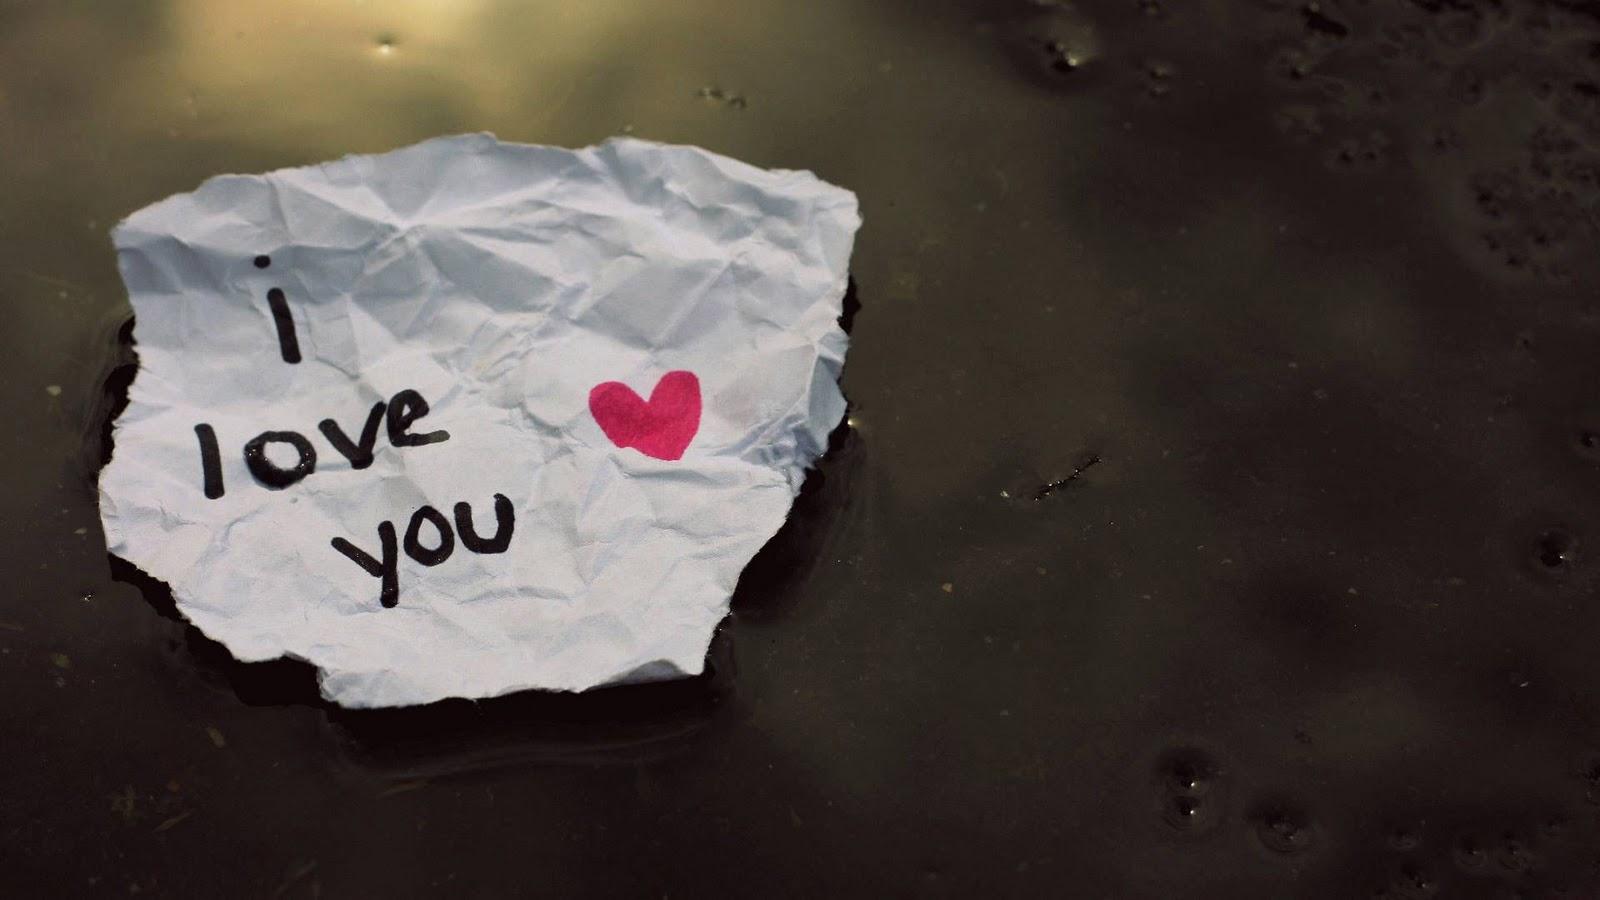 http://3.bp.blogspot.com/--pY9iZvsaWY/Tzp3F0xckxI/AAAAAAAAAnY/ChE7O_s2JJQ/s1600/valentines-day-wallpaper-17.jpg